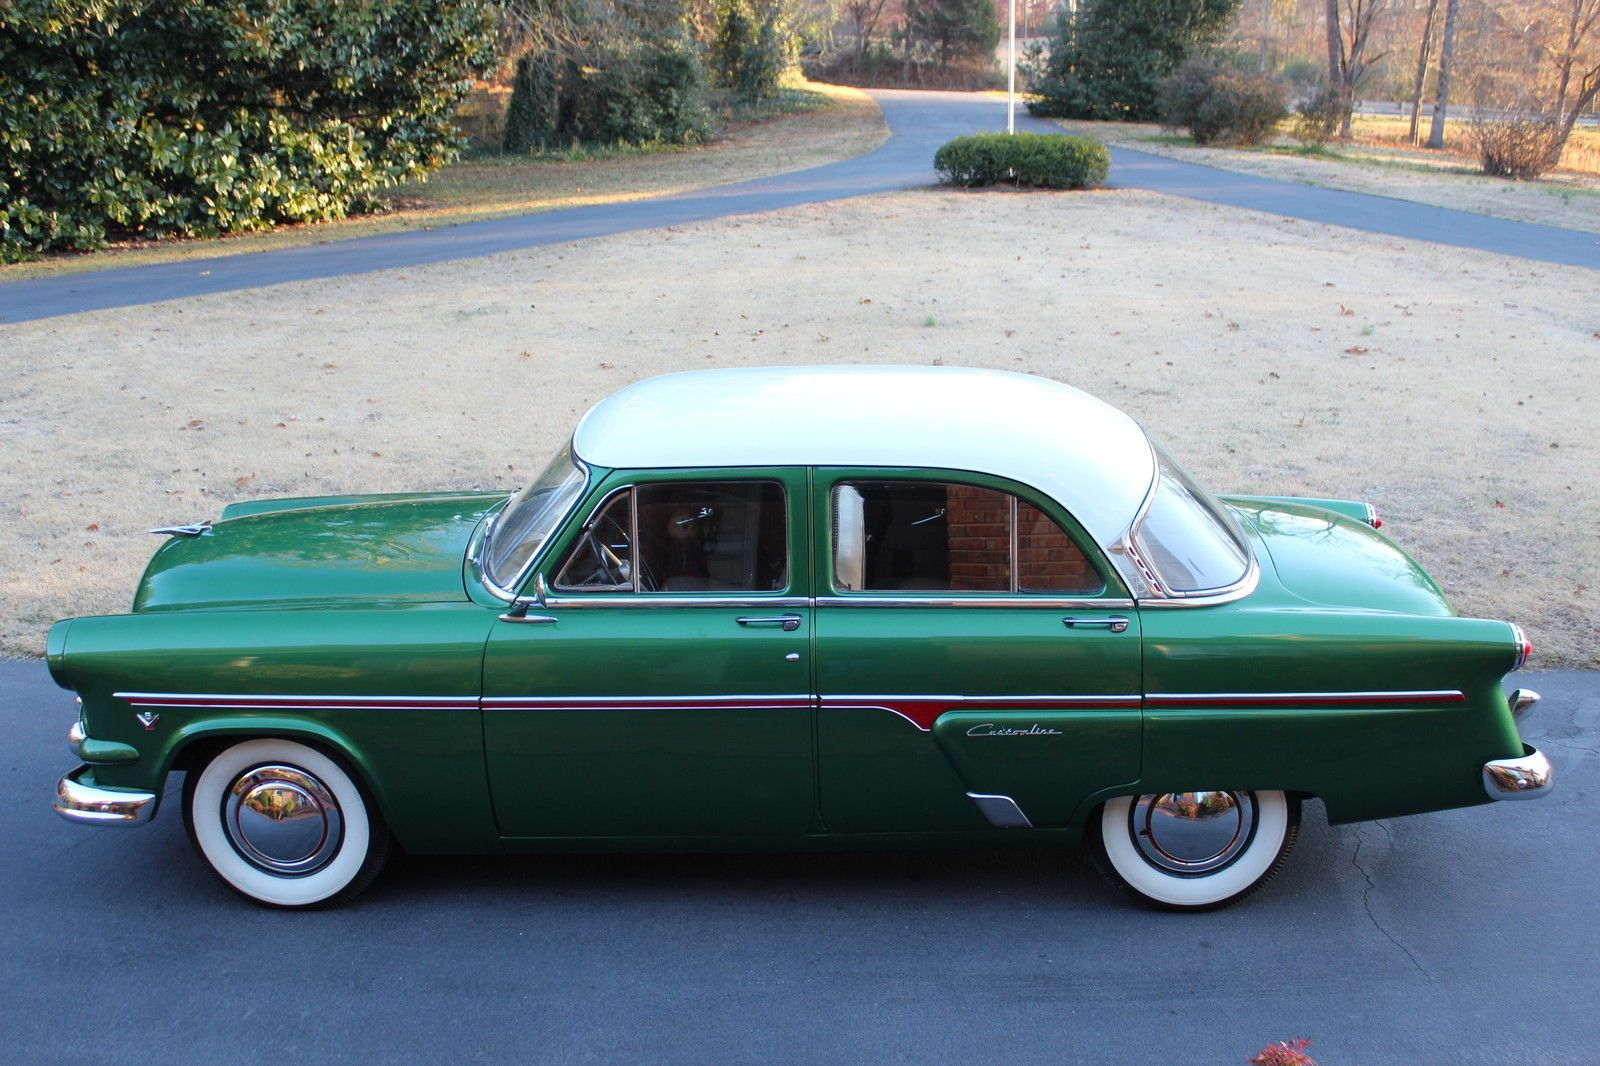 54 model ford customline sedan 4 doors antique cars for 1953 ford customline 4 door